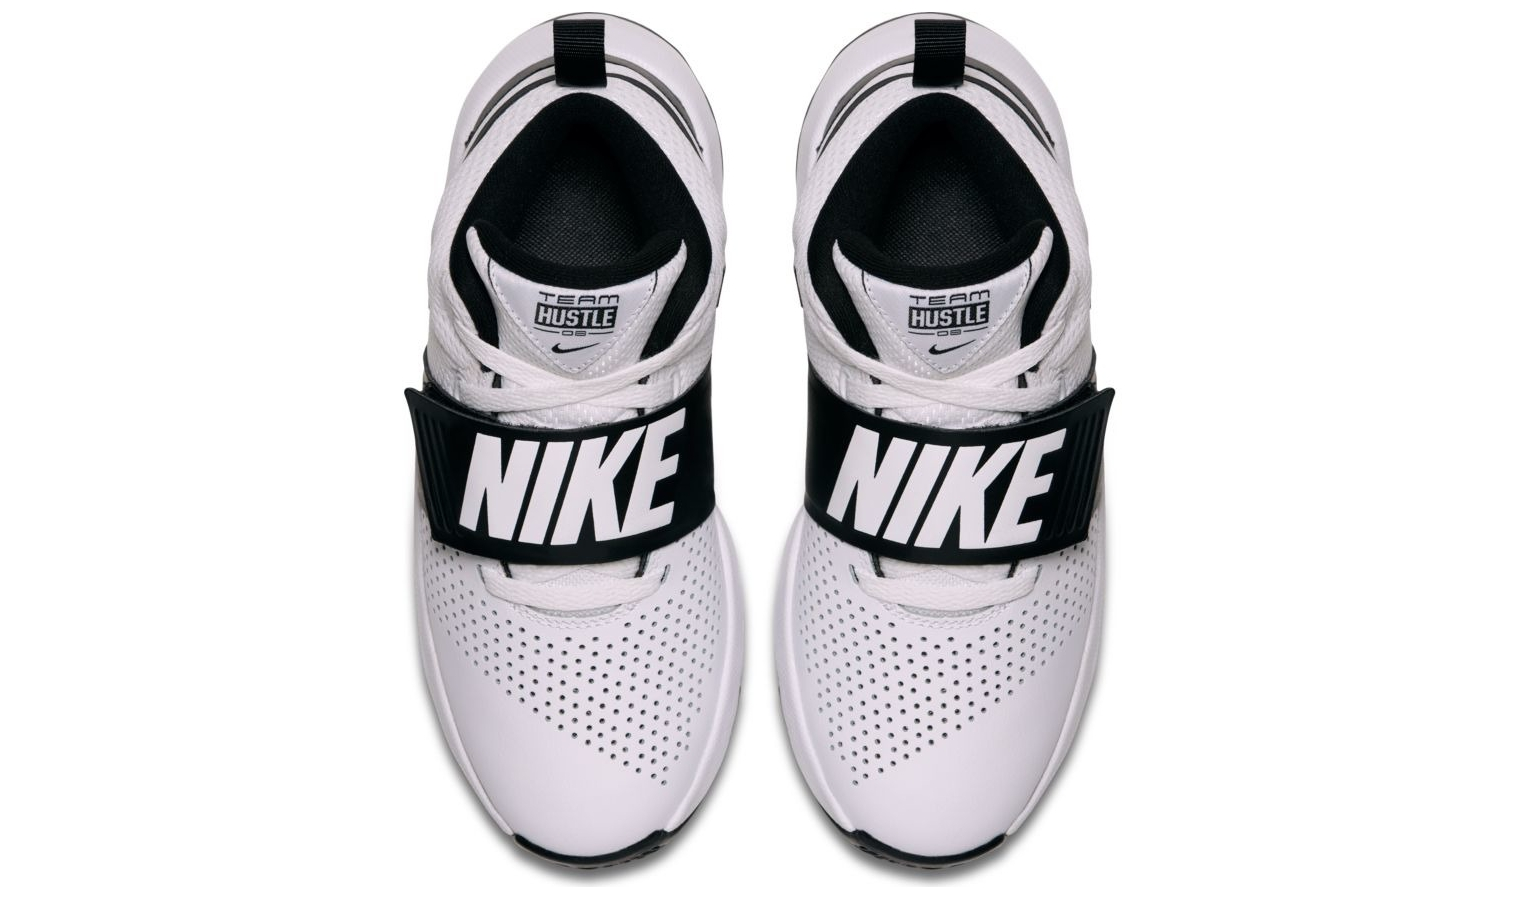 2633774fc3c99 Detské basketbalové topánky Nike TEAM HUSTLE D 8 (GS) biele | AD ...